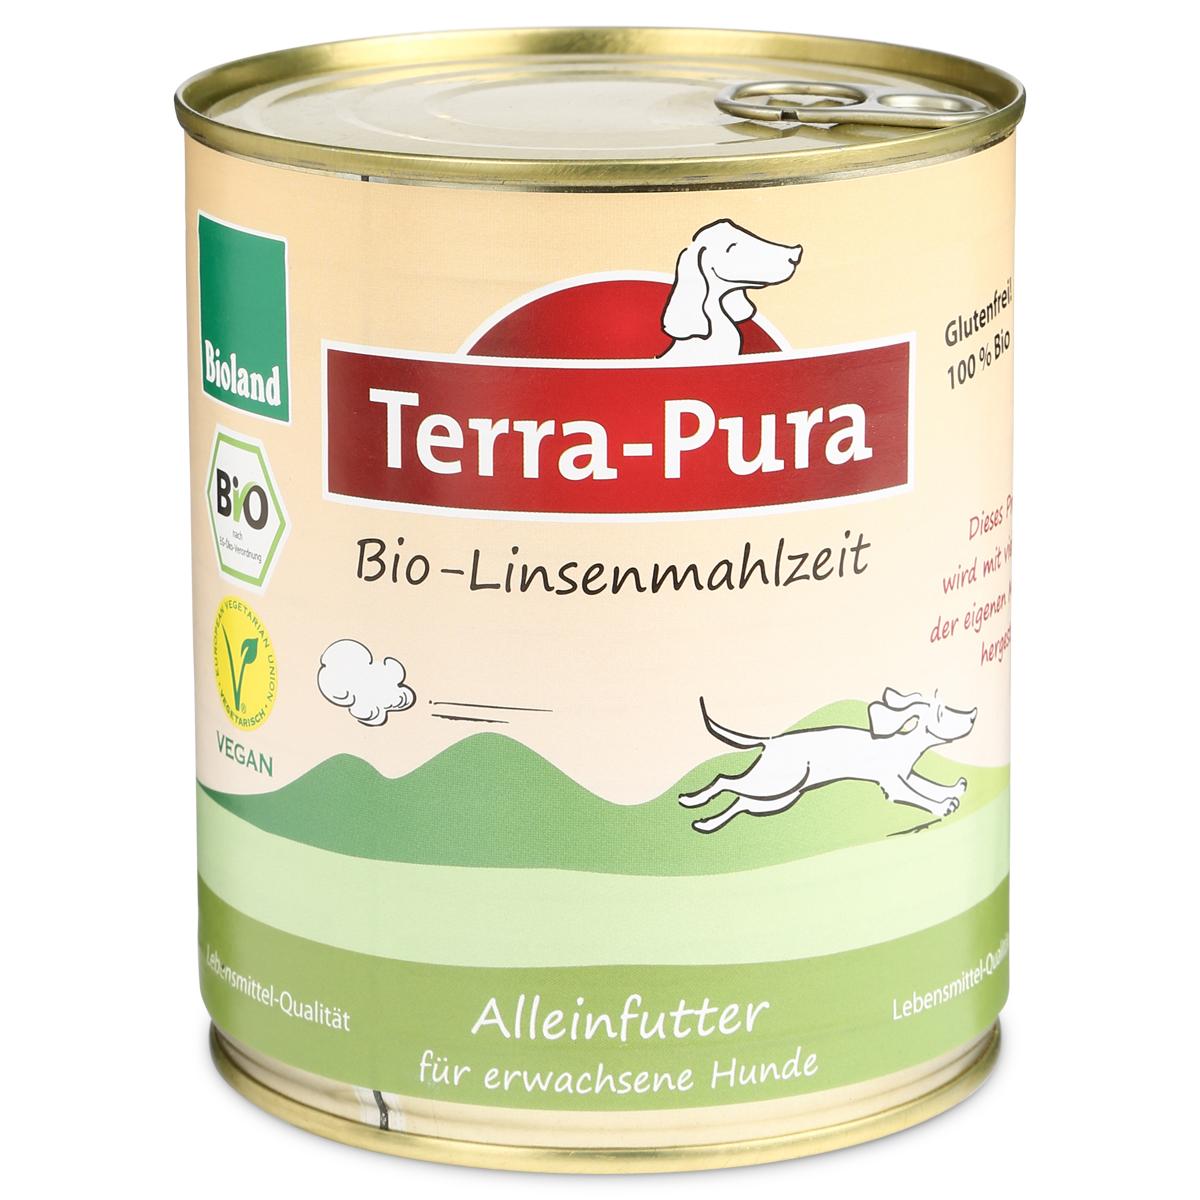 Terra Pura Hundefutter Bio-Linsenmahlzeit Vegan 6×750g